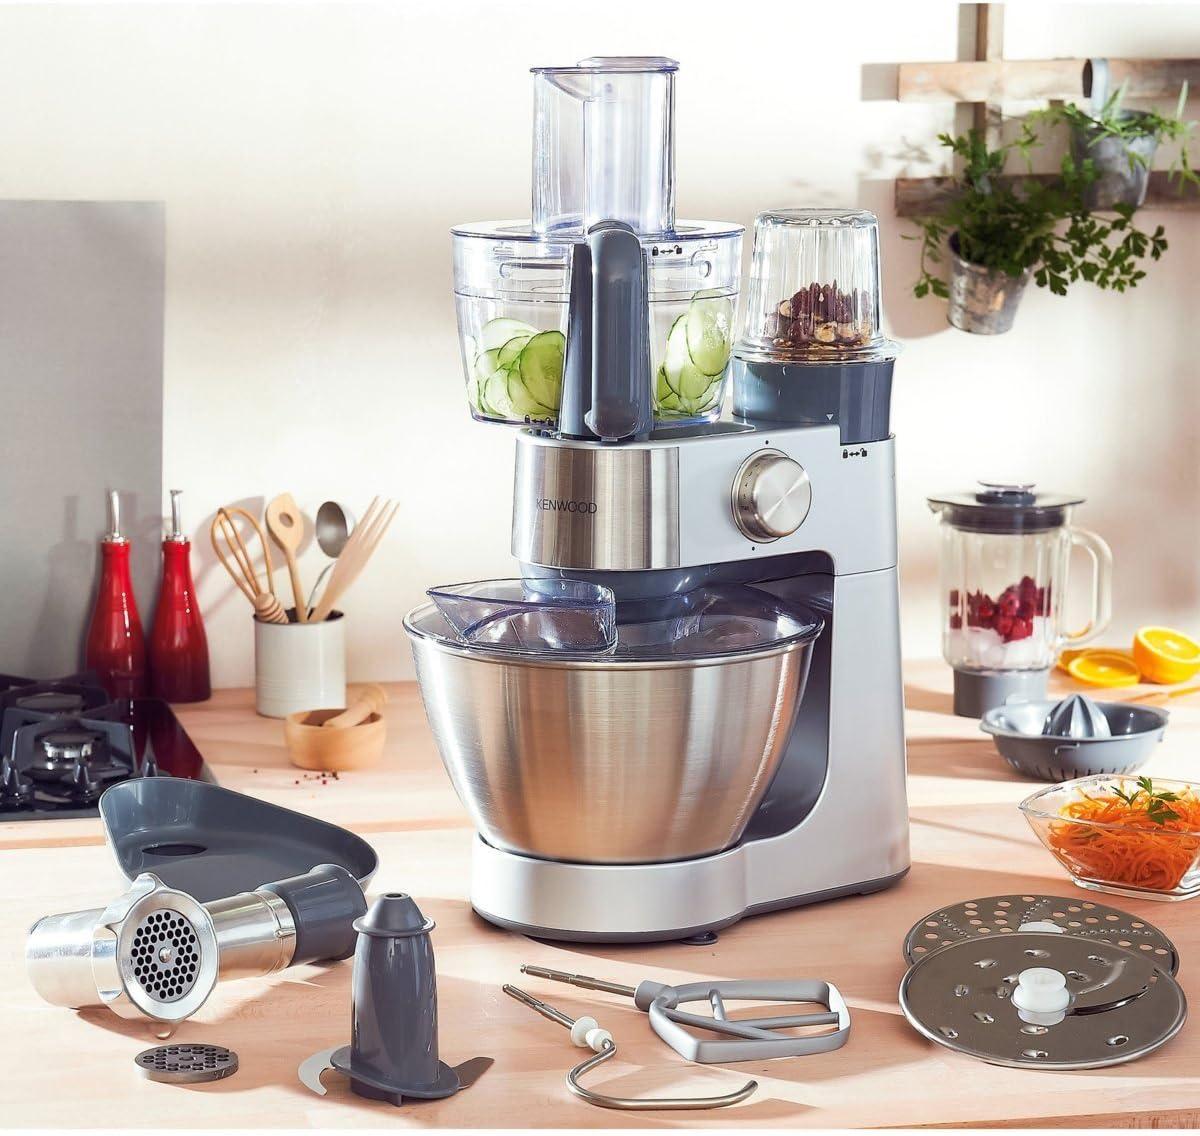 Kenwood Prospero KM286 900W 4.3L Acero inoxidable - Robot de cocina (4,3 L, Acero inoxidable, Acero inoxidable, De plástico, 900 W, 243 mm): Amazon.es: Hogar